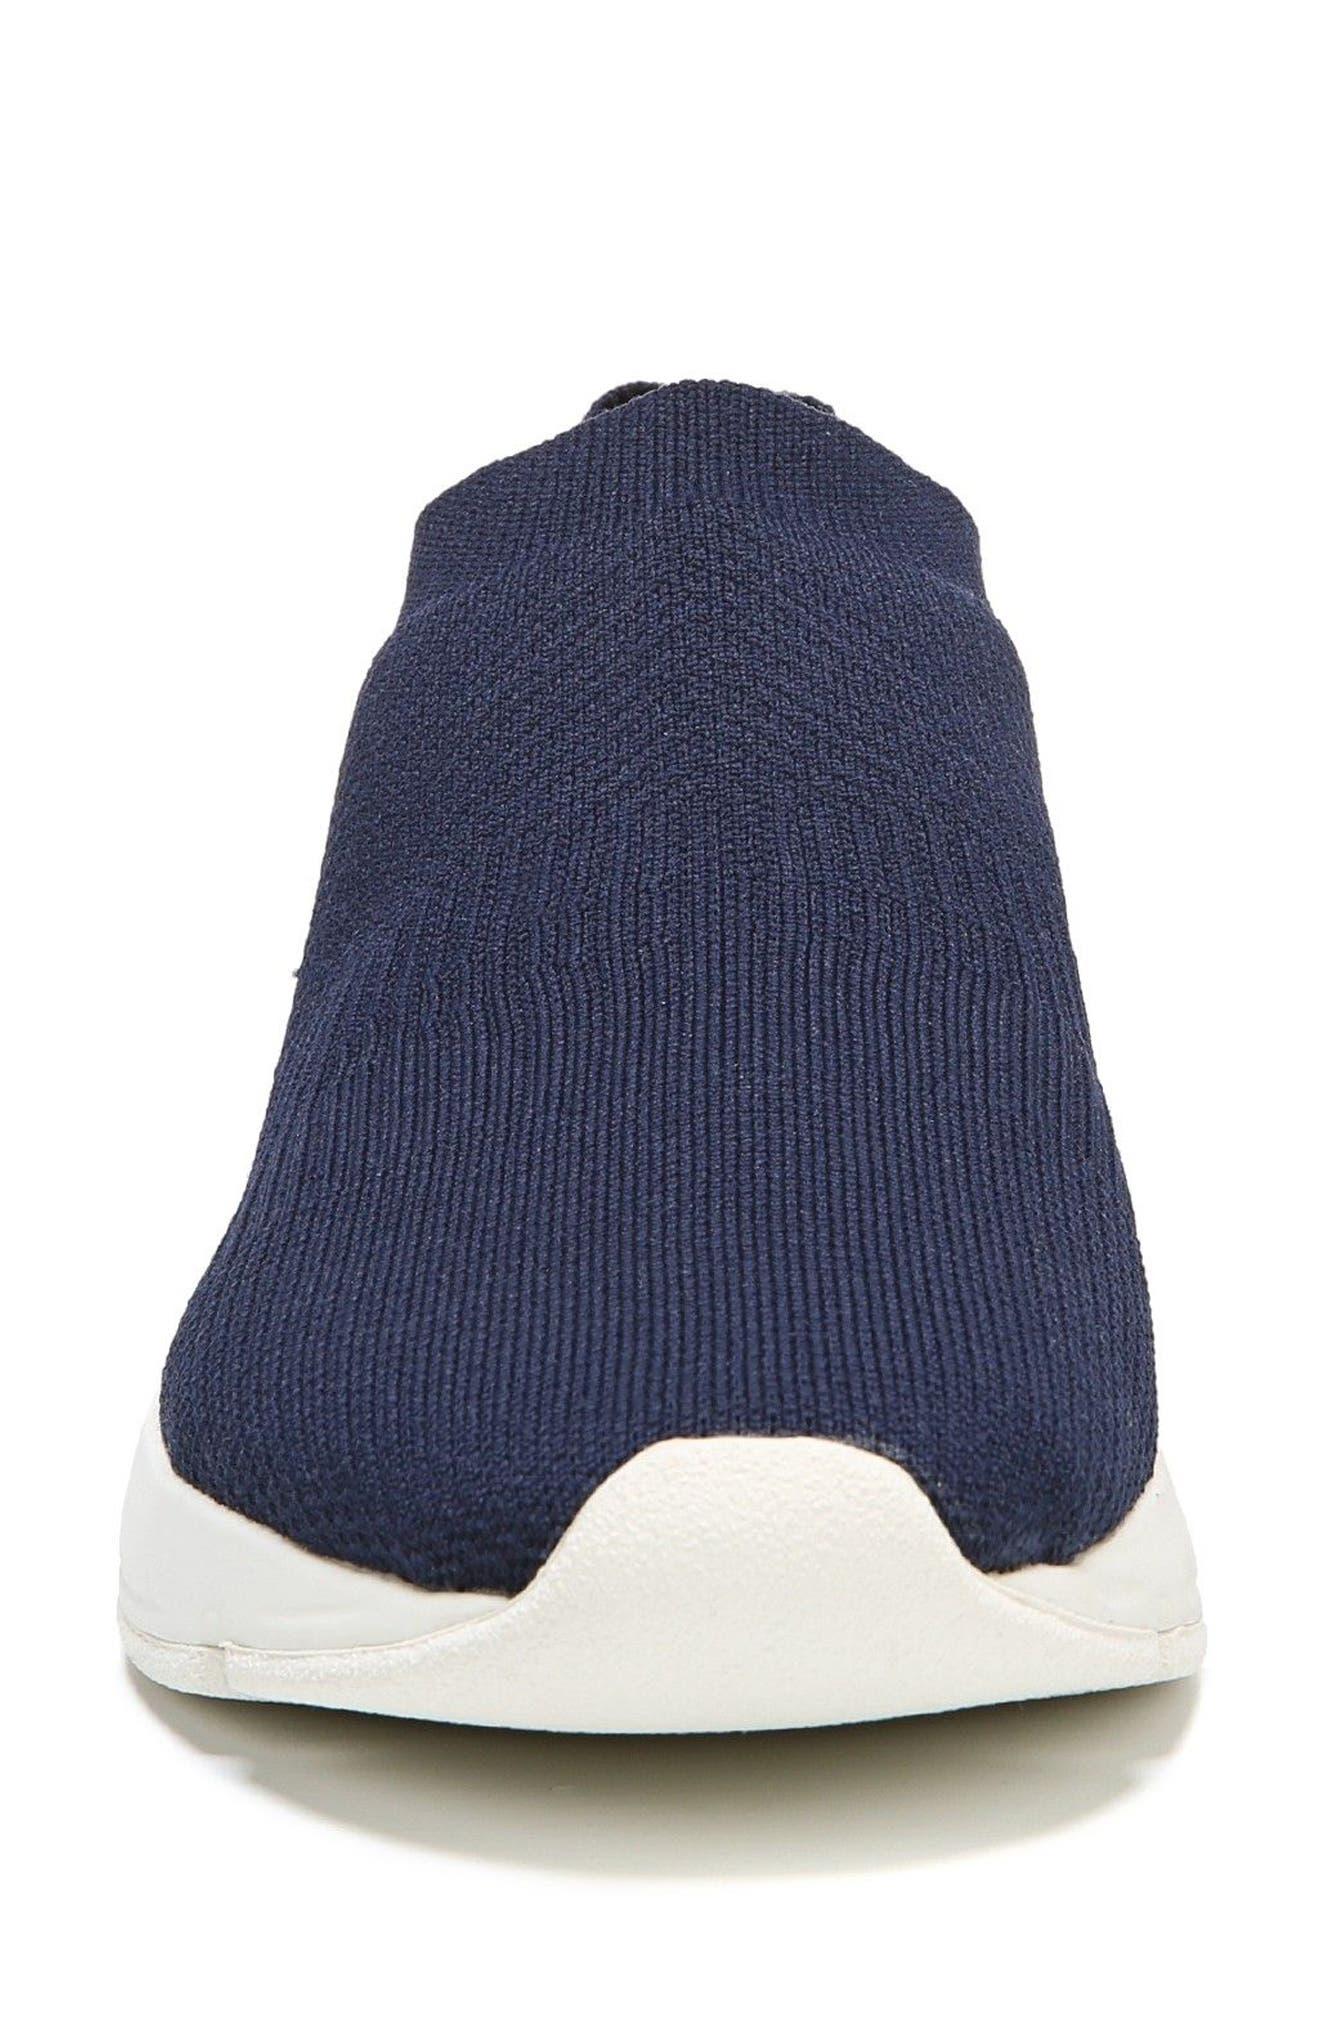 Theroux Slip-On Knit Sneaker,                             Alternate thumbnail 5, color,                             Navy